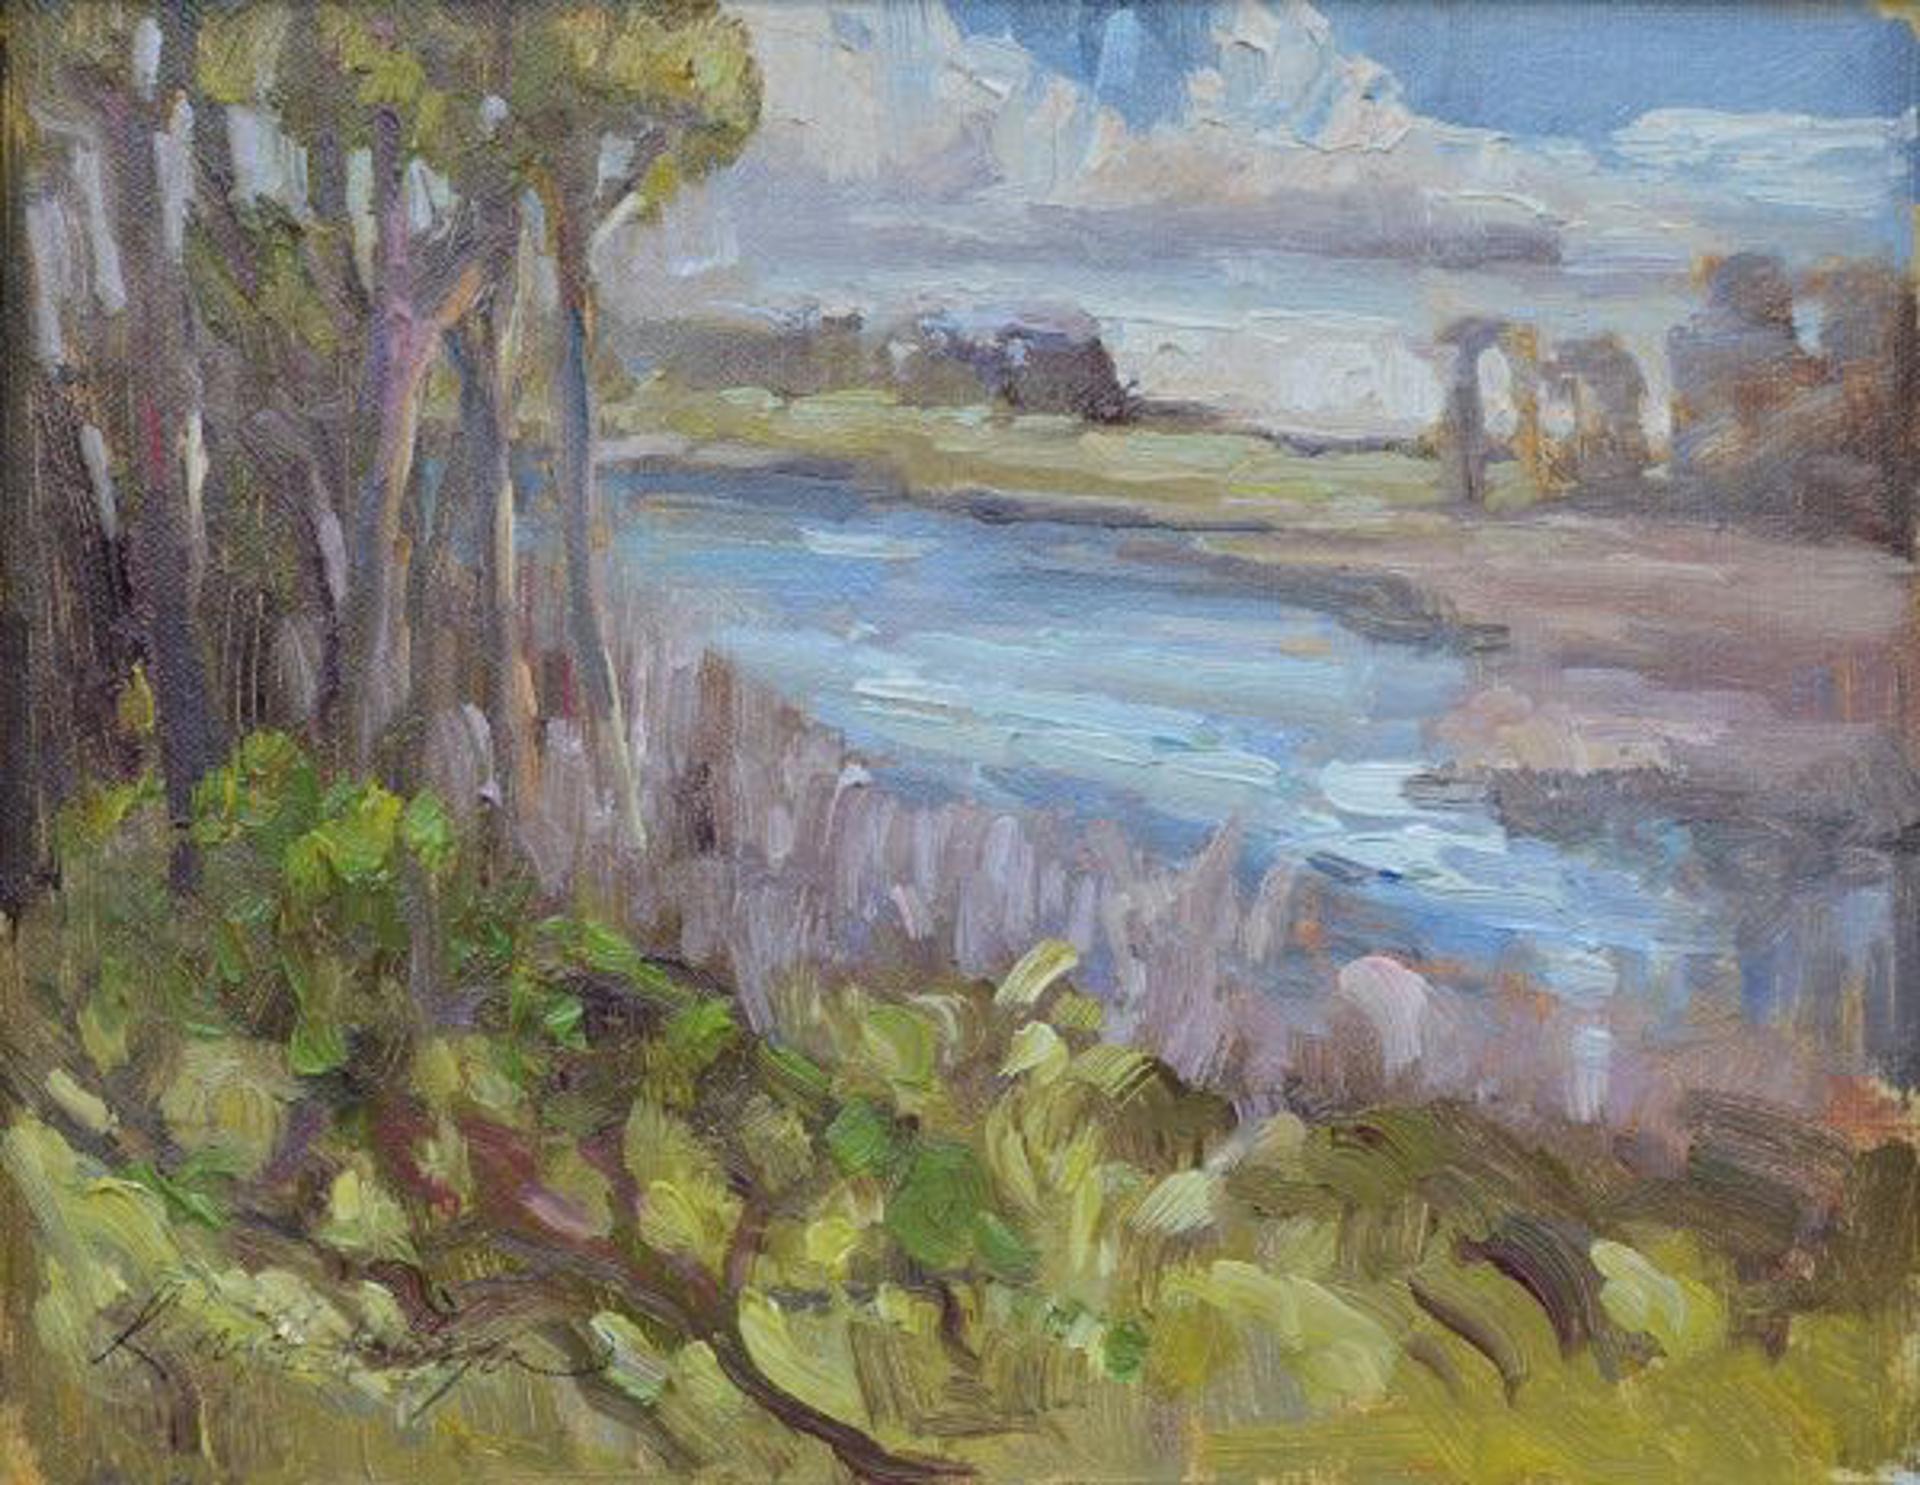 The Kiawah River by Karen Hewitt Hagan